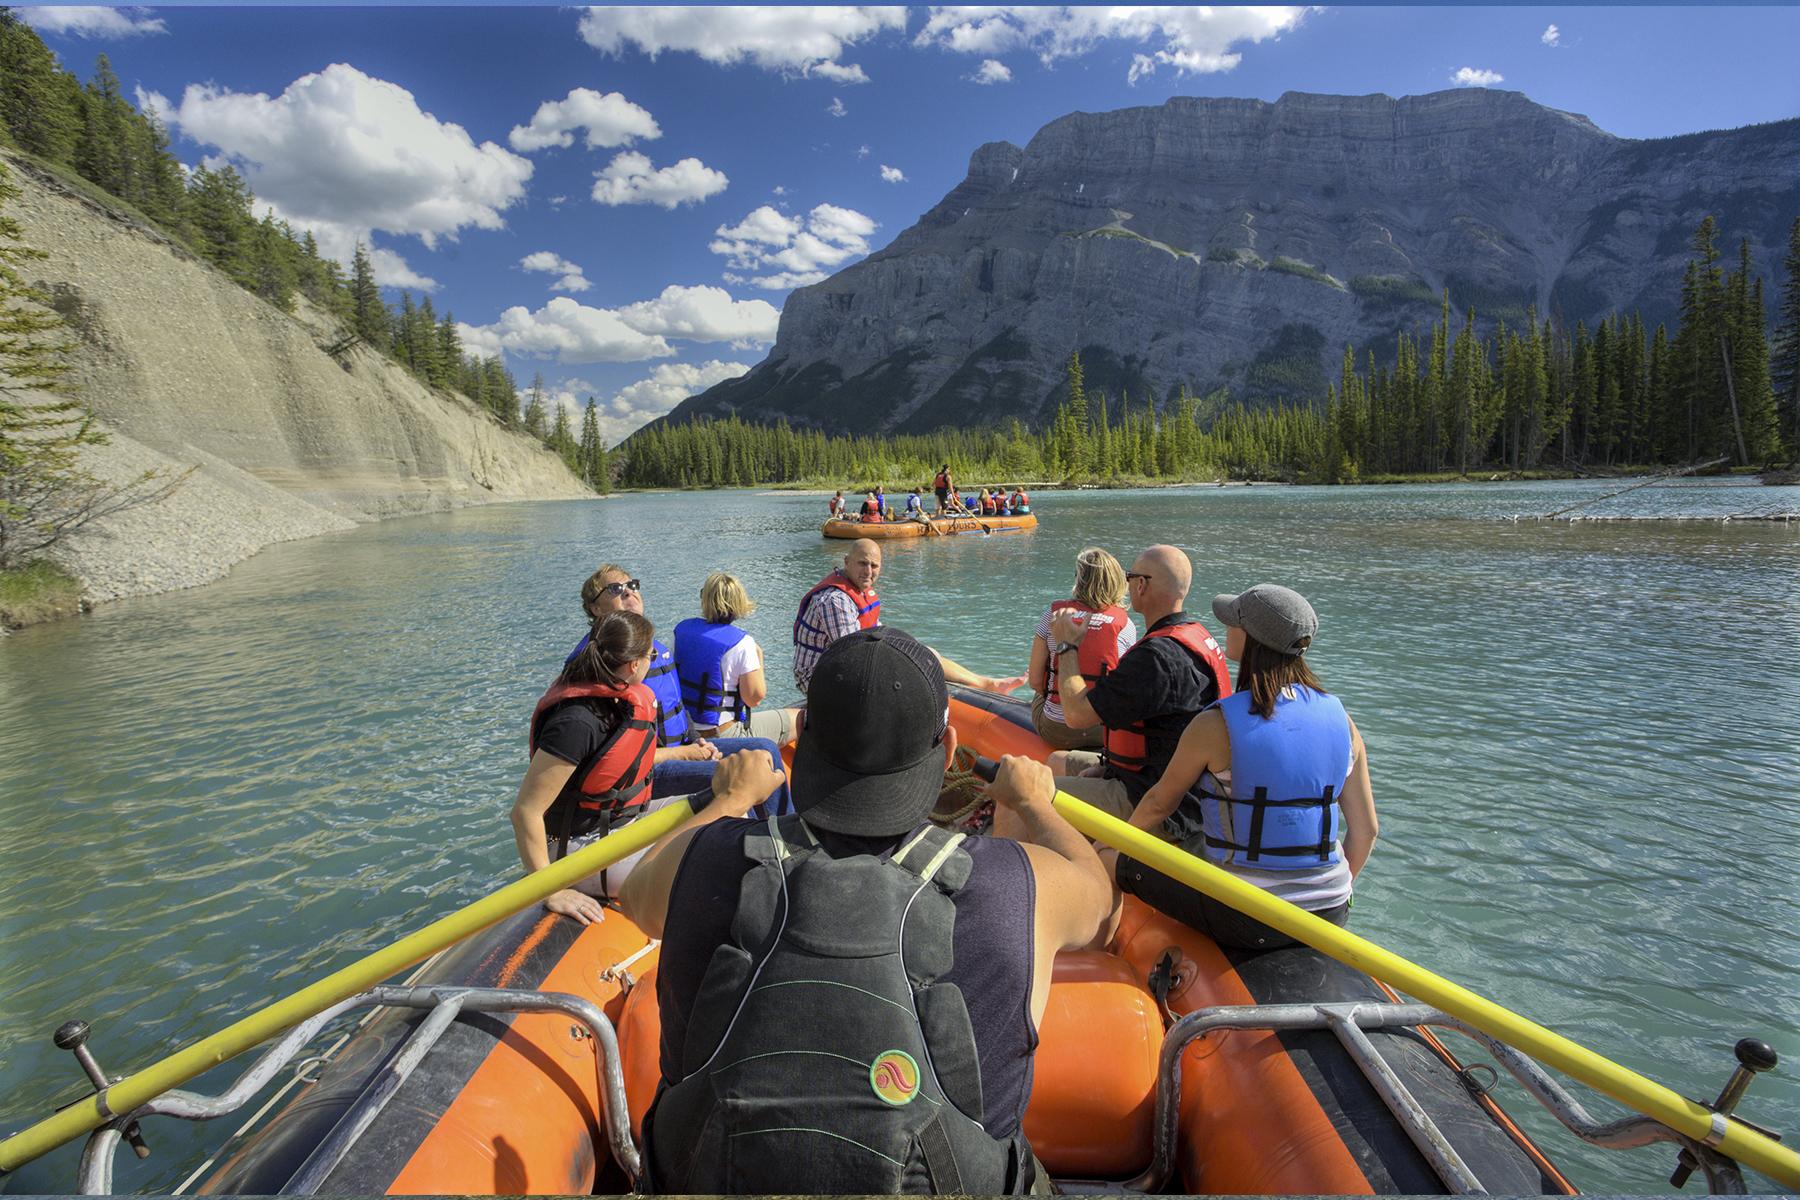 bow-lake-icefields-parkaway-alberta-canada-bote-personas